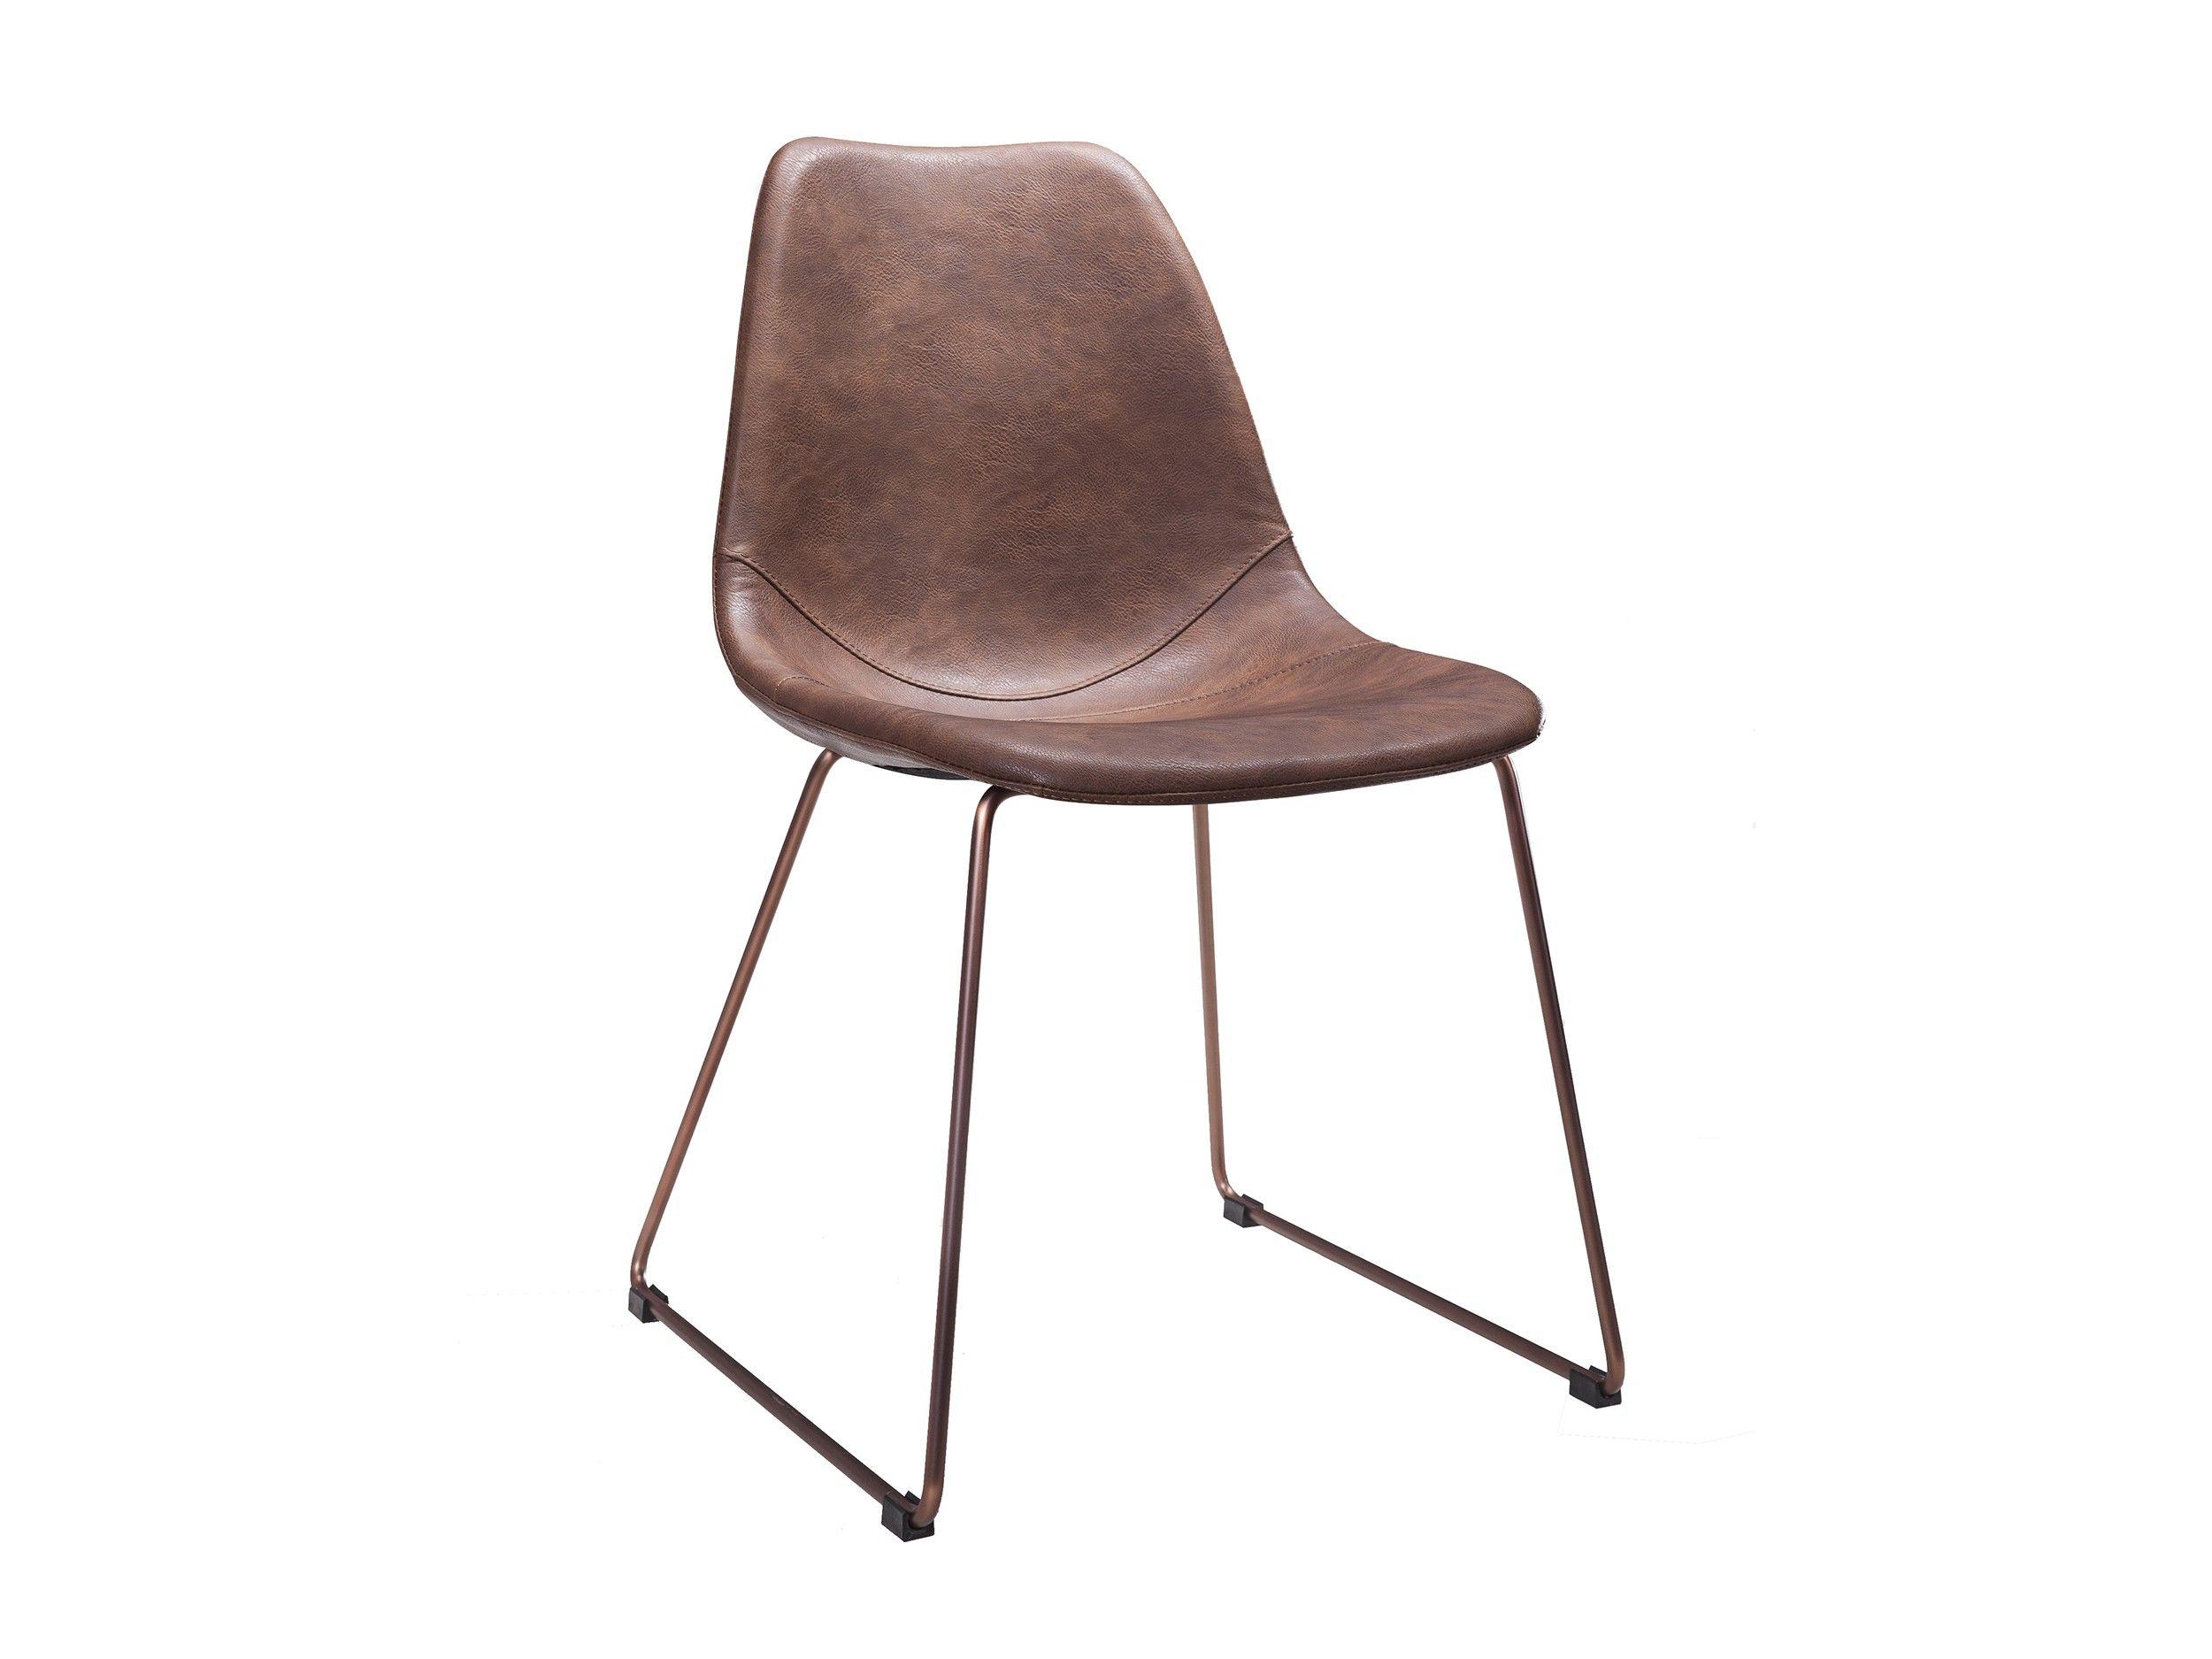 ARTEMIS Stol 2 Vintagebrun/Kobber (med bilder) Stol